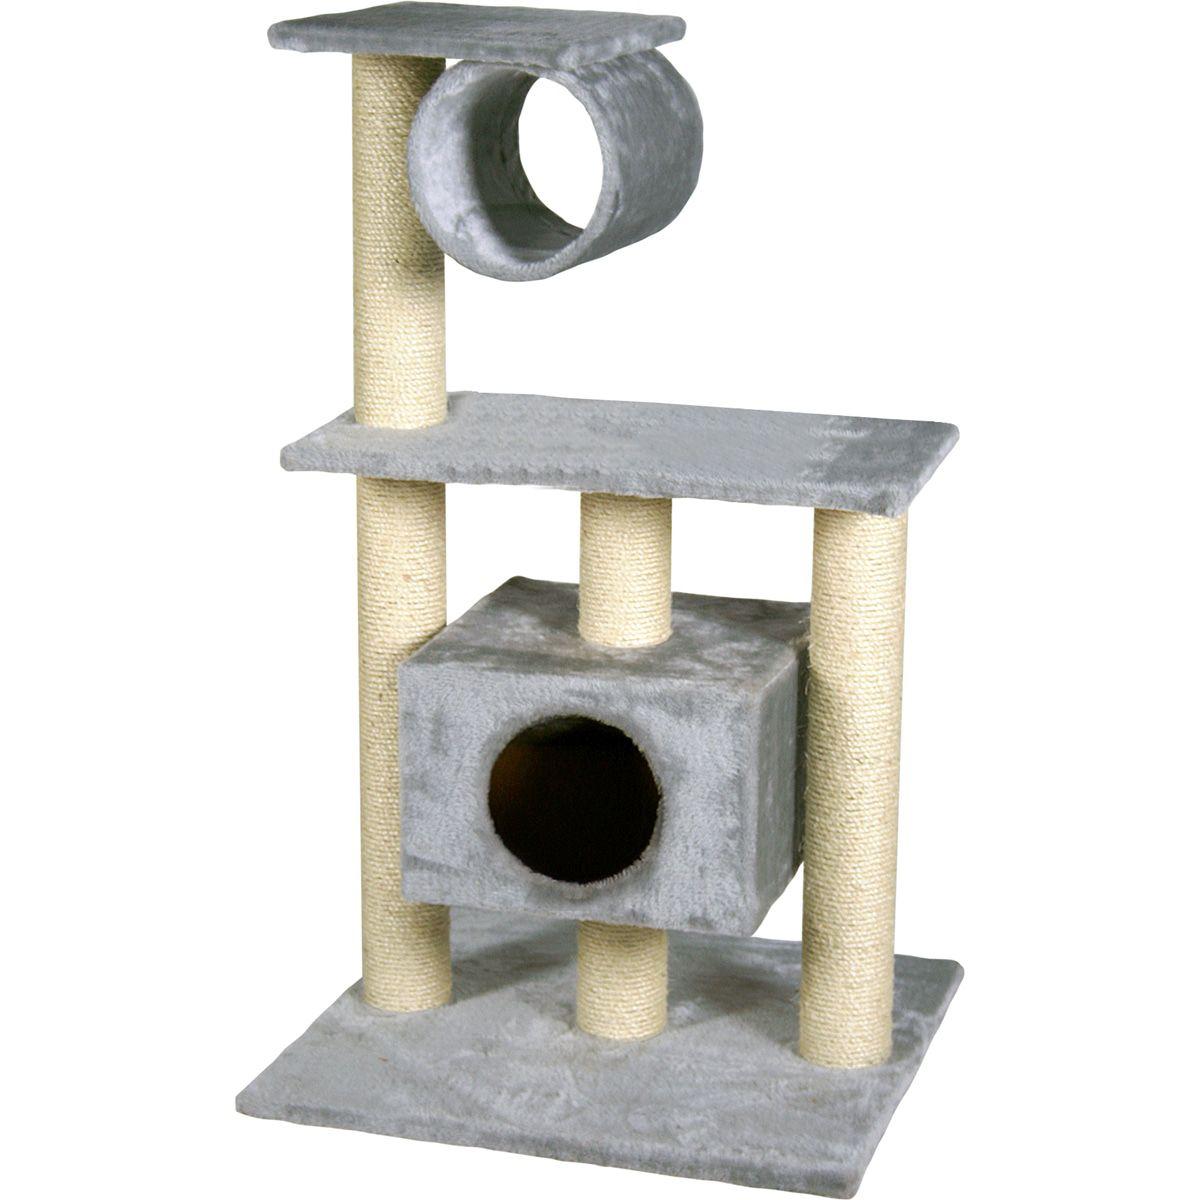 Krabpaal-Teide-Grijs-60-x-57-x-103-cm-Flamingo-Grijs